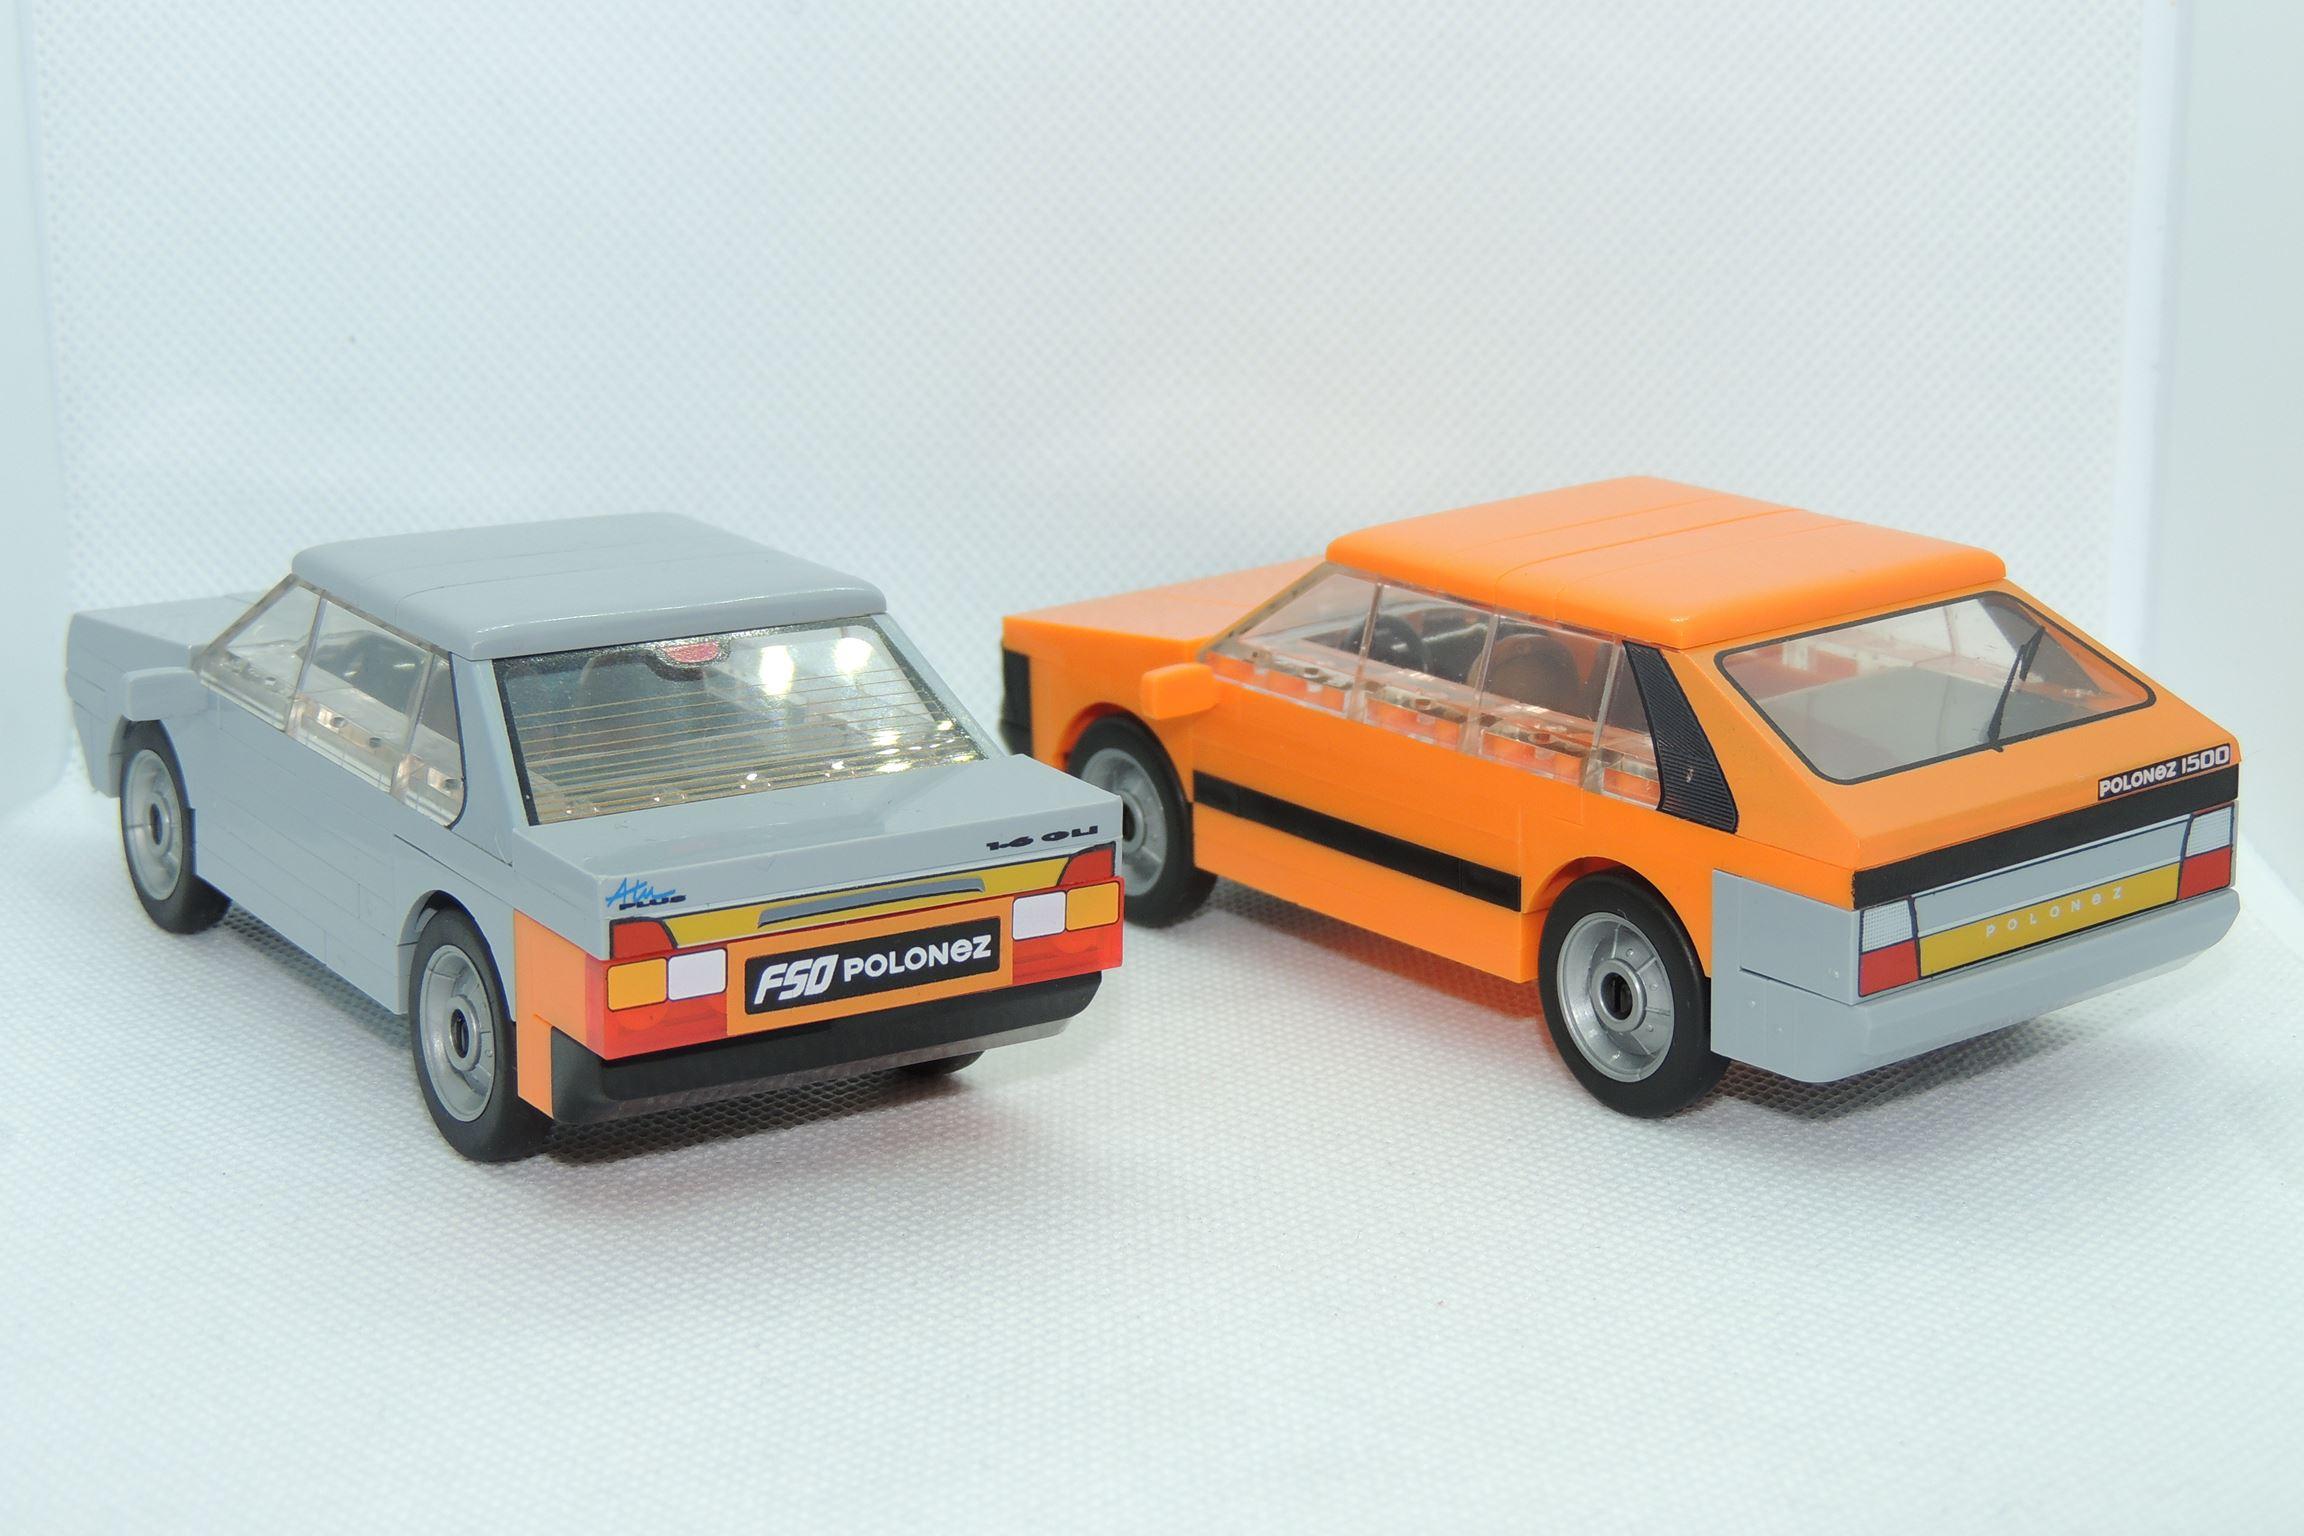 Fahrzeugkomponenten untereinander kompatibel.